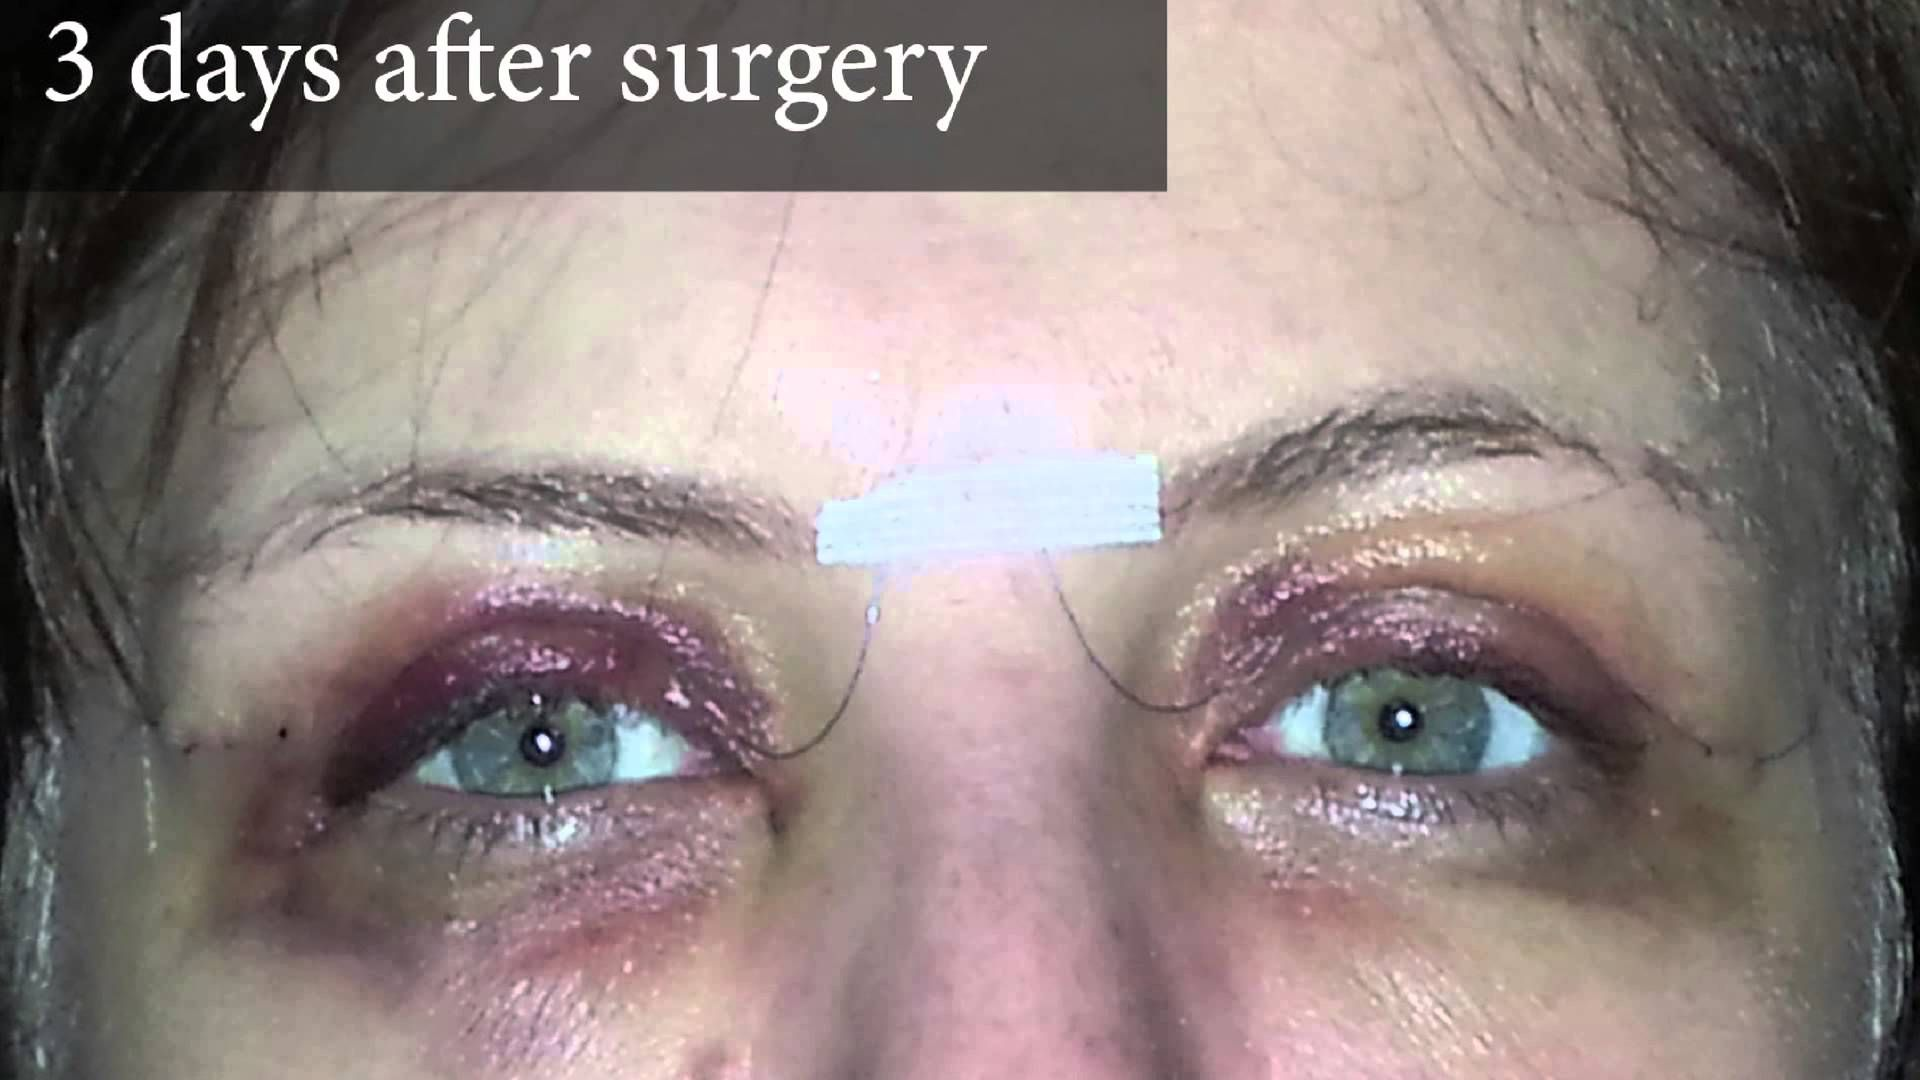 Eyes Brows Eyelid Surgery Brow Lift Surgery Eyelid Surgery